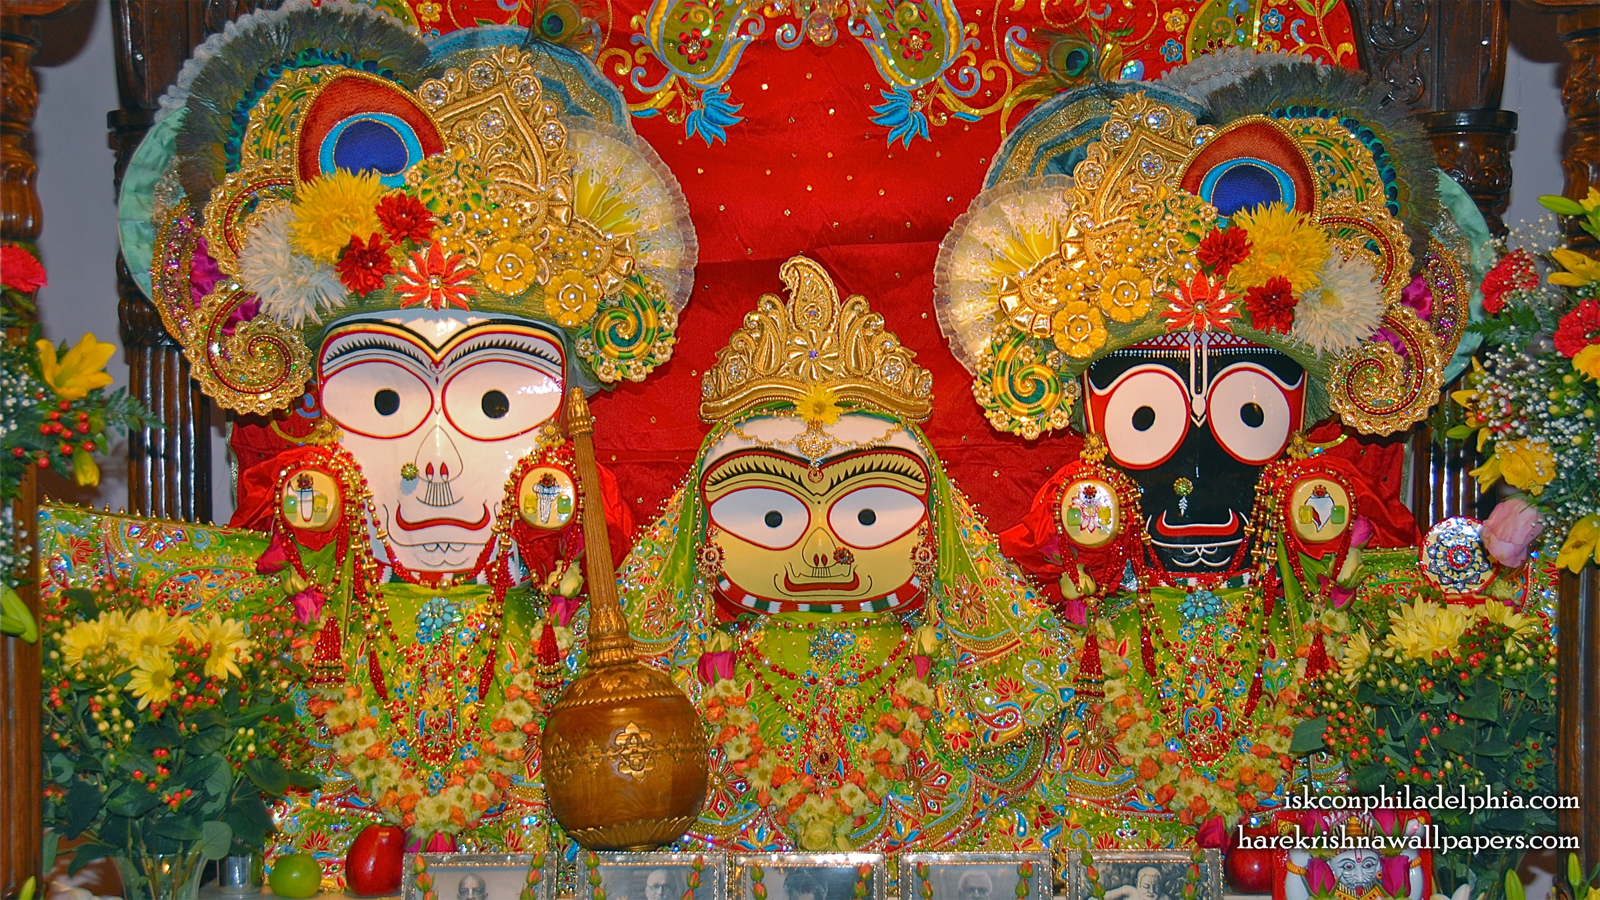 Jagannath Baladeva Subhadra Wallpaper (012) Size 1600x900 Download